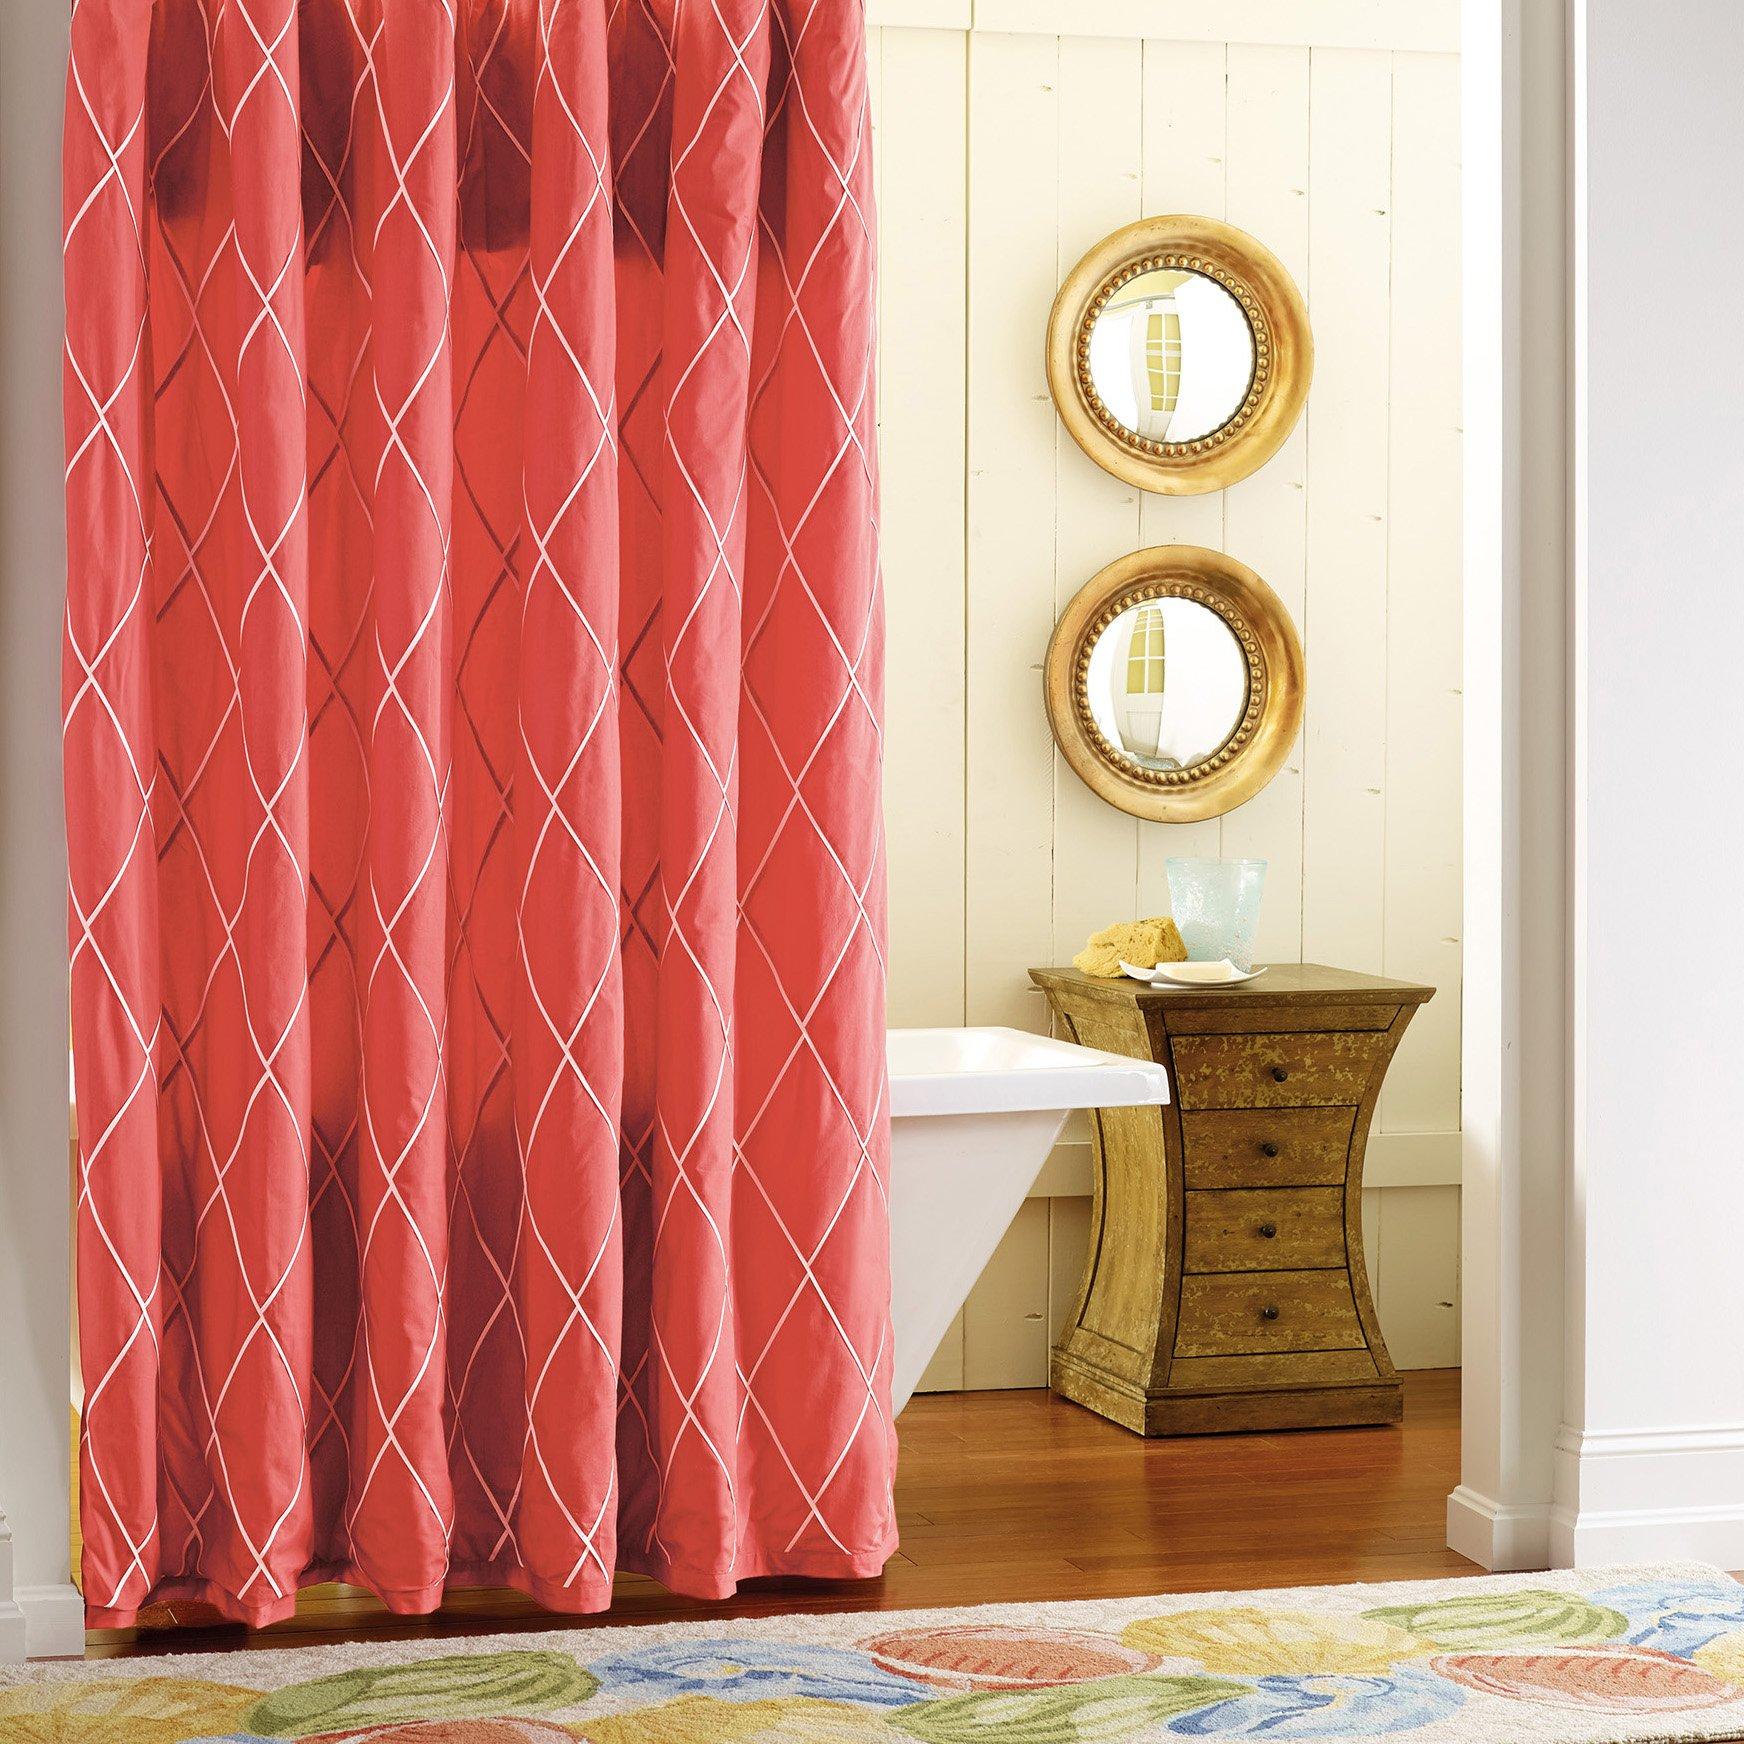 Company C Calypso Shower Curtain, 0, Red